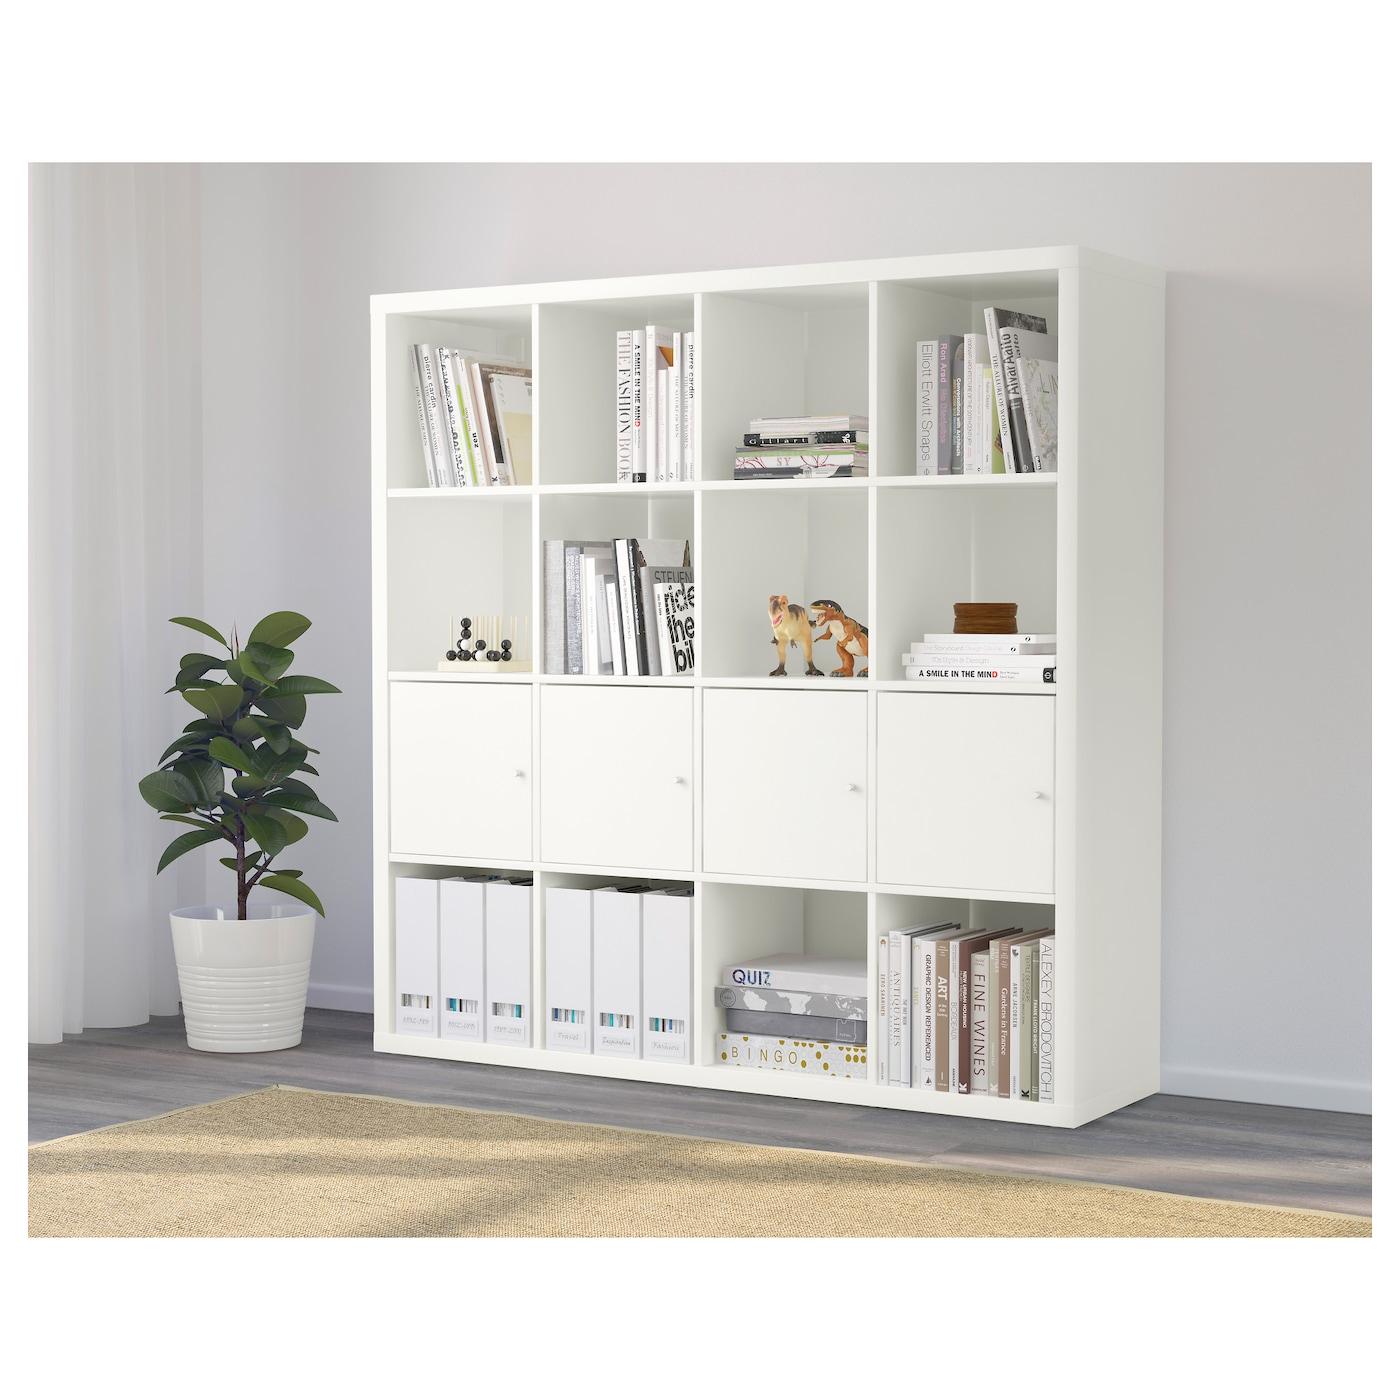 kallax tag re avec 4 accessoires blanc 147x147 cm ikea. Black Bedroom Furniture Sets. Home Design Ideas